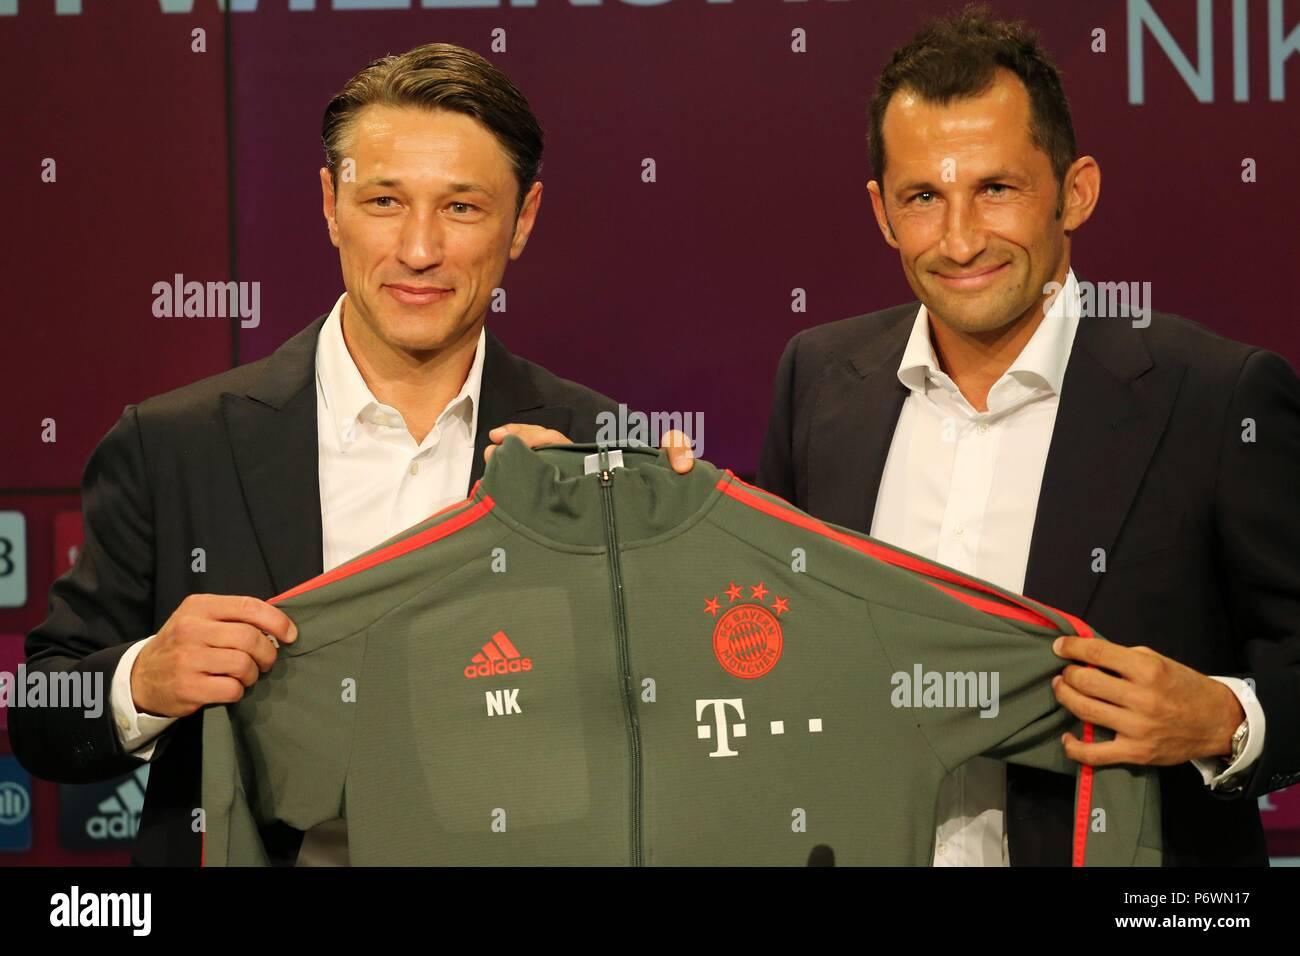 Mnchen Deutschland 02 Juli 2018 Firo 02072018 Fuball 1 Pindah Kredit0 Des Fc Bayern Niko Kovac Hasan Salihamidzic Gestik Mimik Jersey Transfer Verwendung Der Weltweiten Kredit